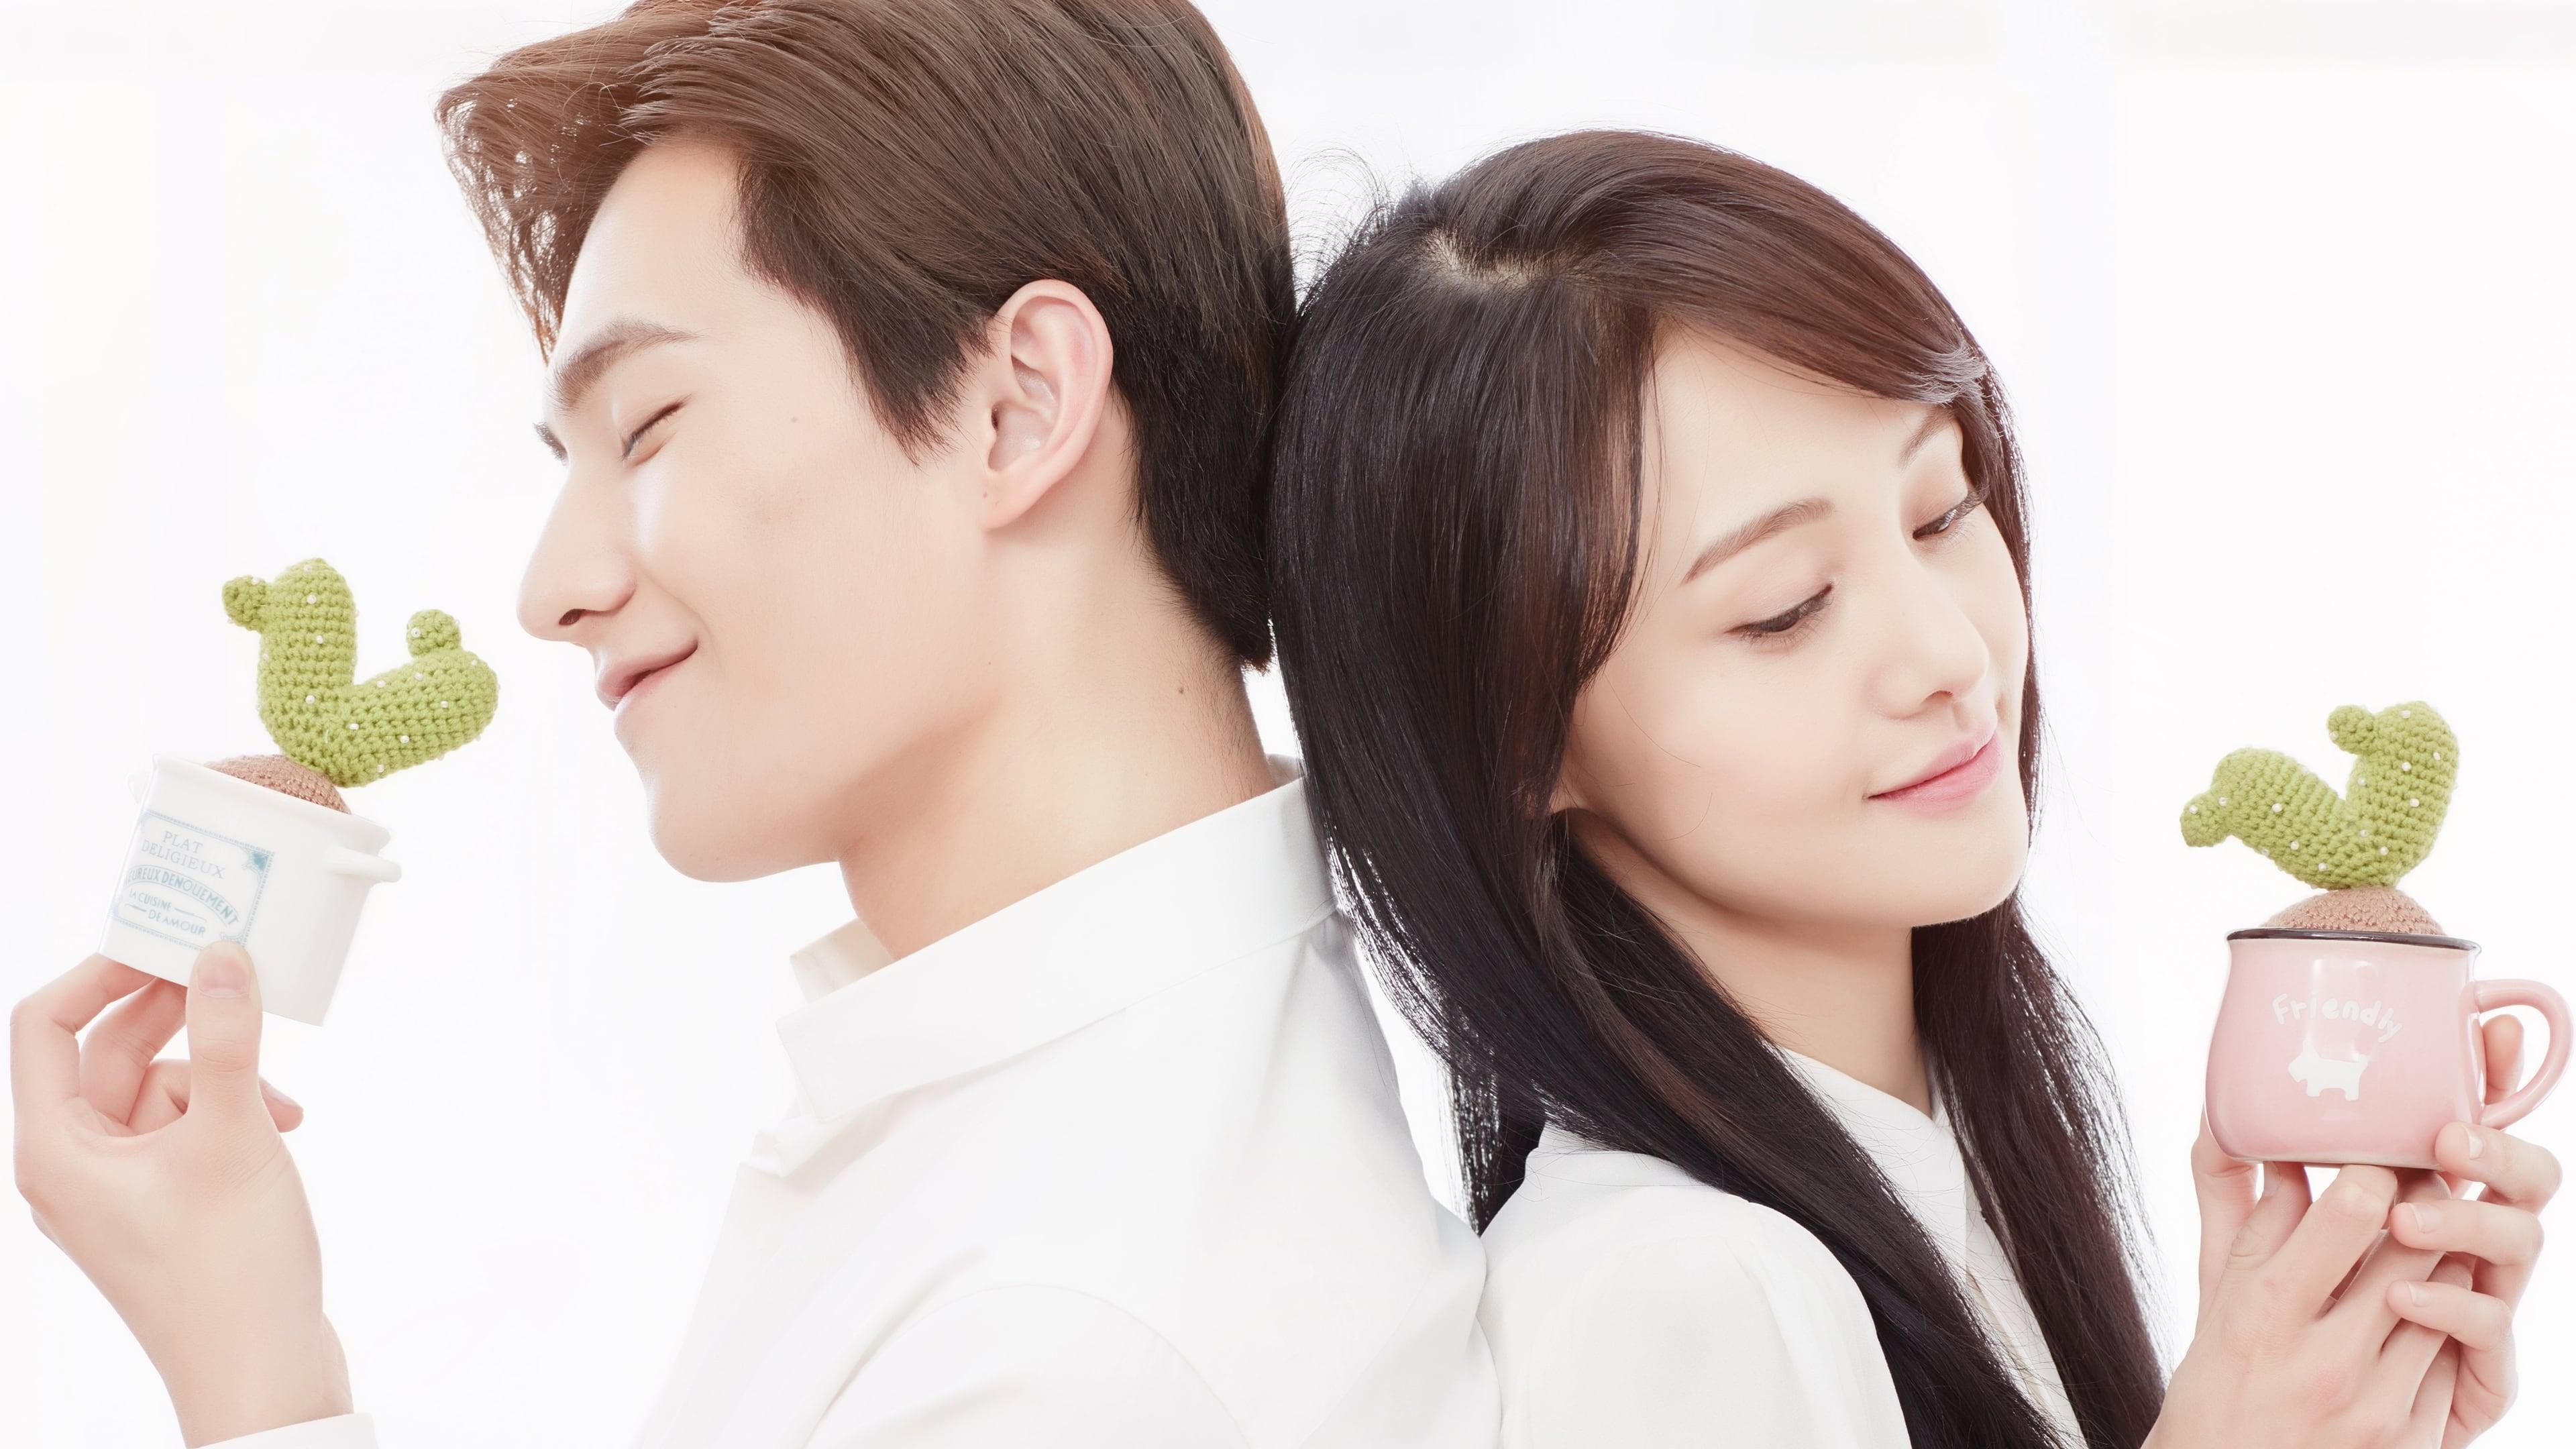 Yêu Em Từ Cái Nhìn Đầu Tiên - Love O2O | Razorphim